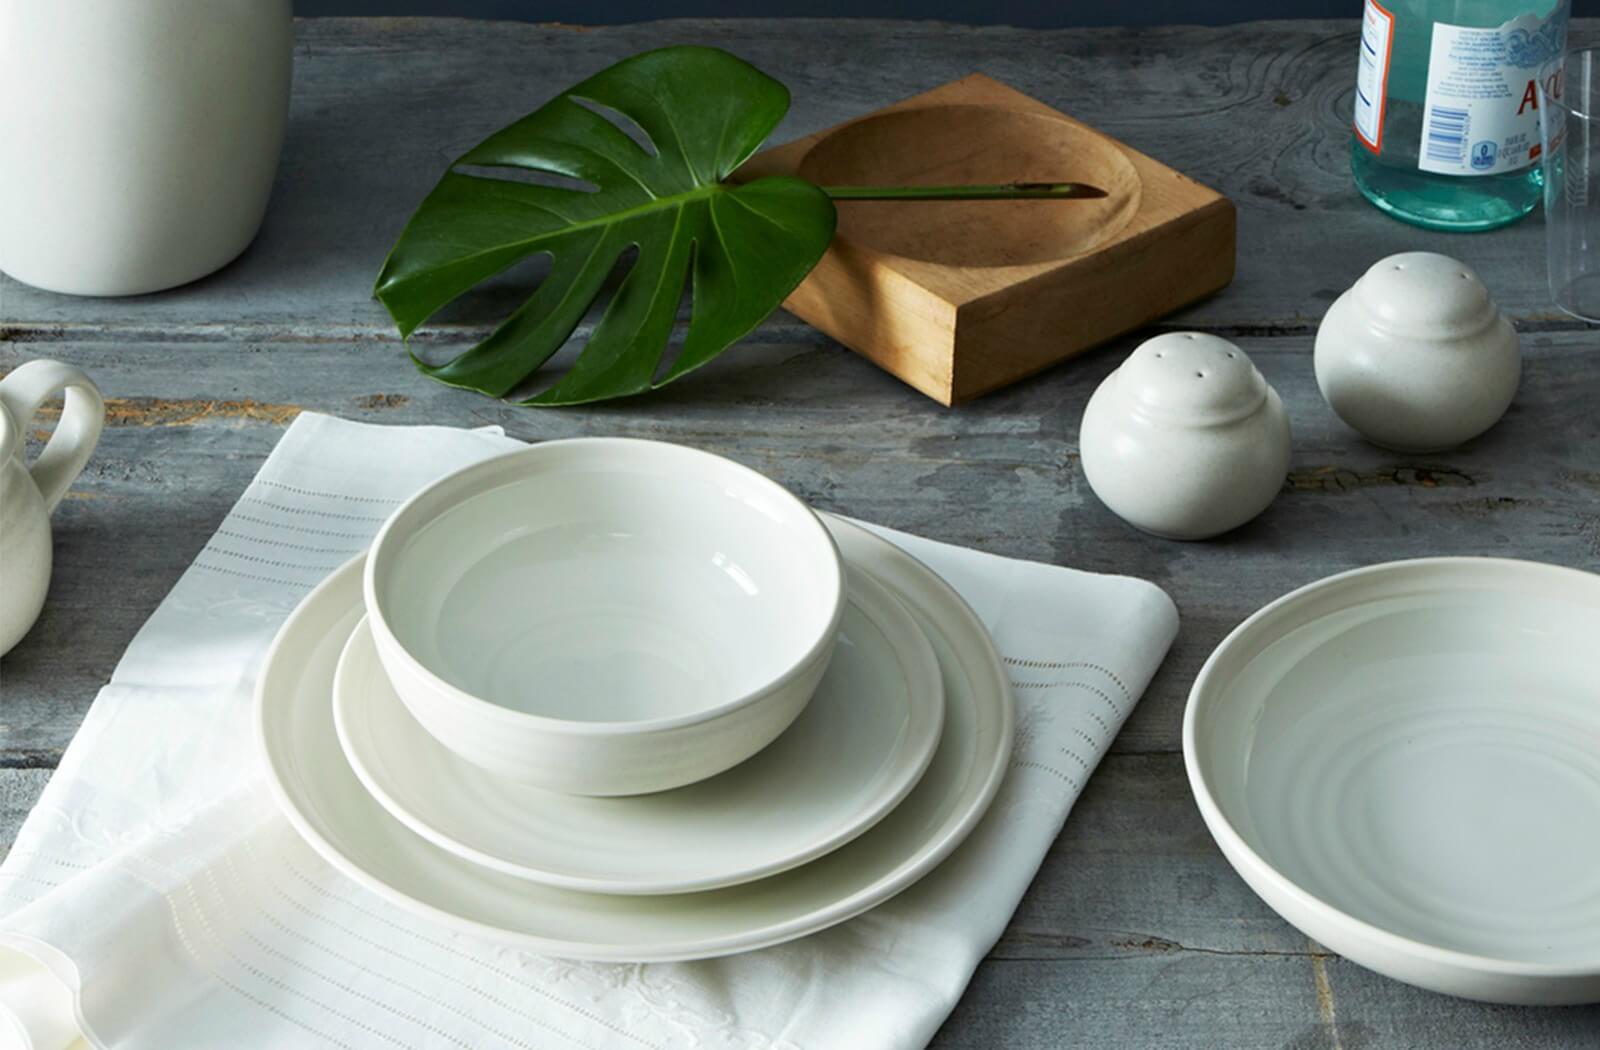 discount on noritake tableware & Additional Discount for Noritake Tableware | Sime Darby Property